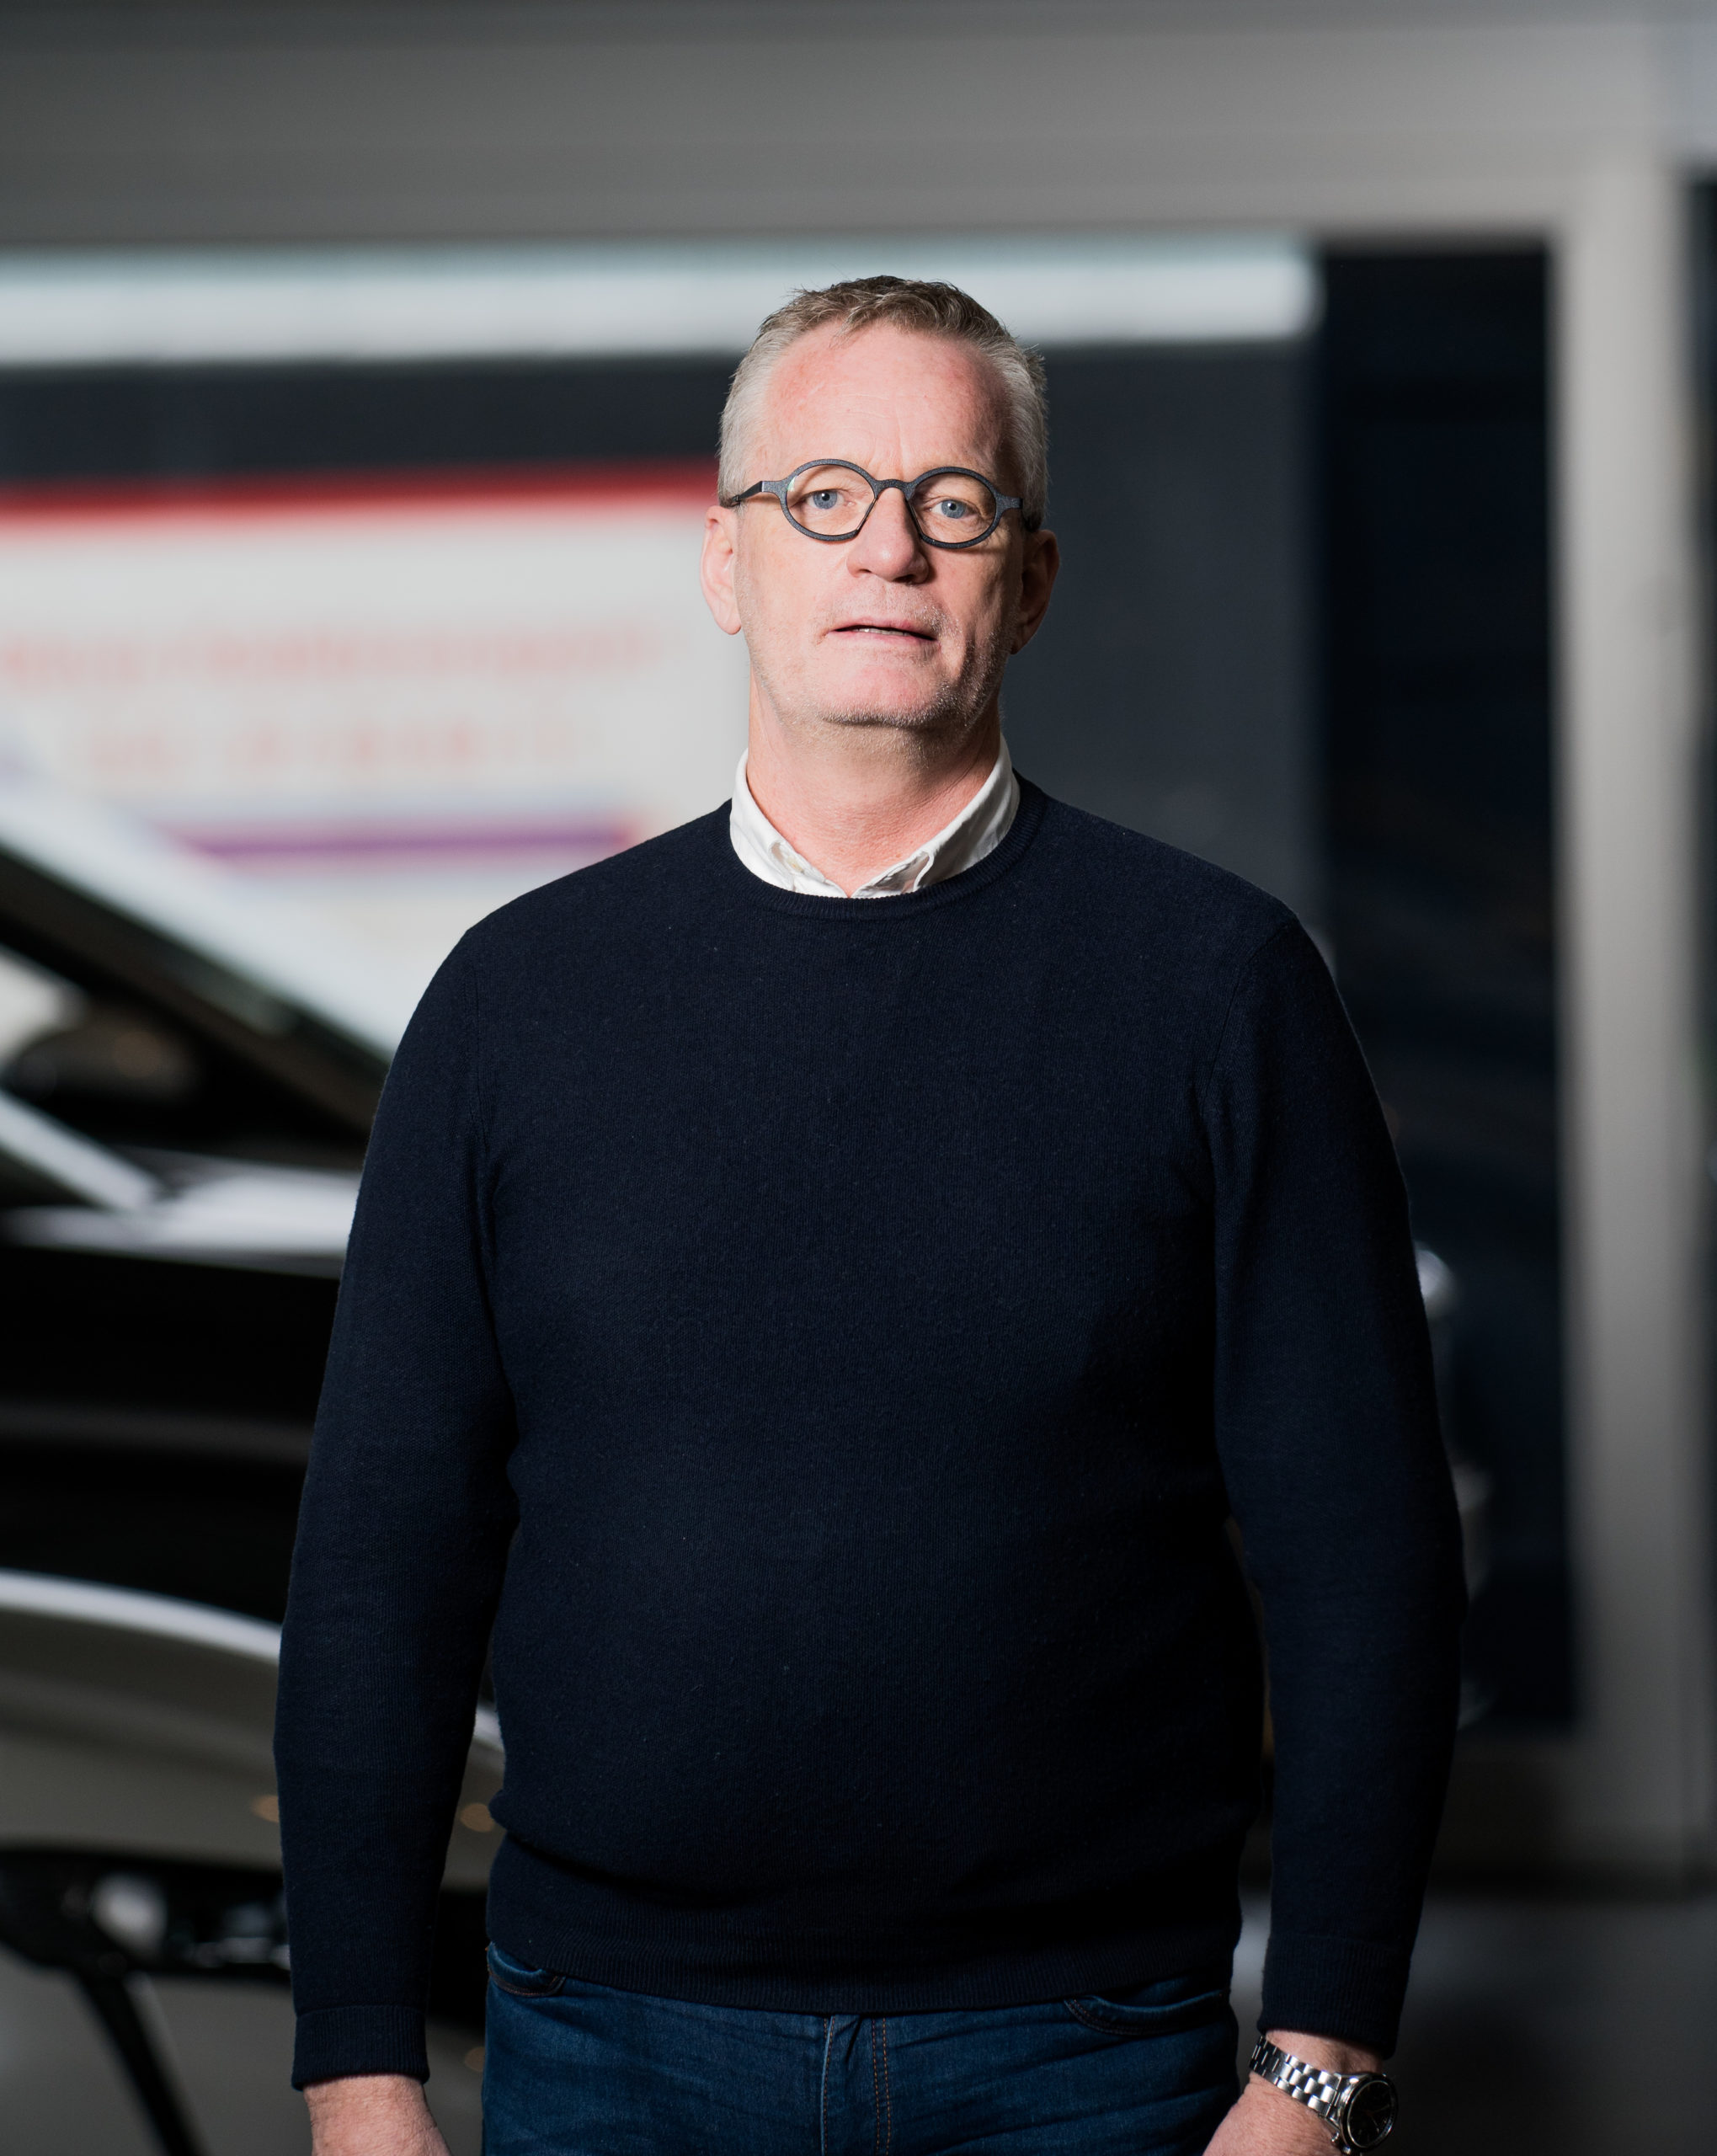 Lars Lüstrup